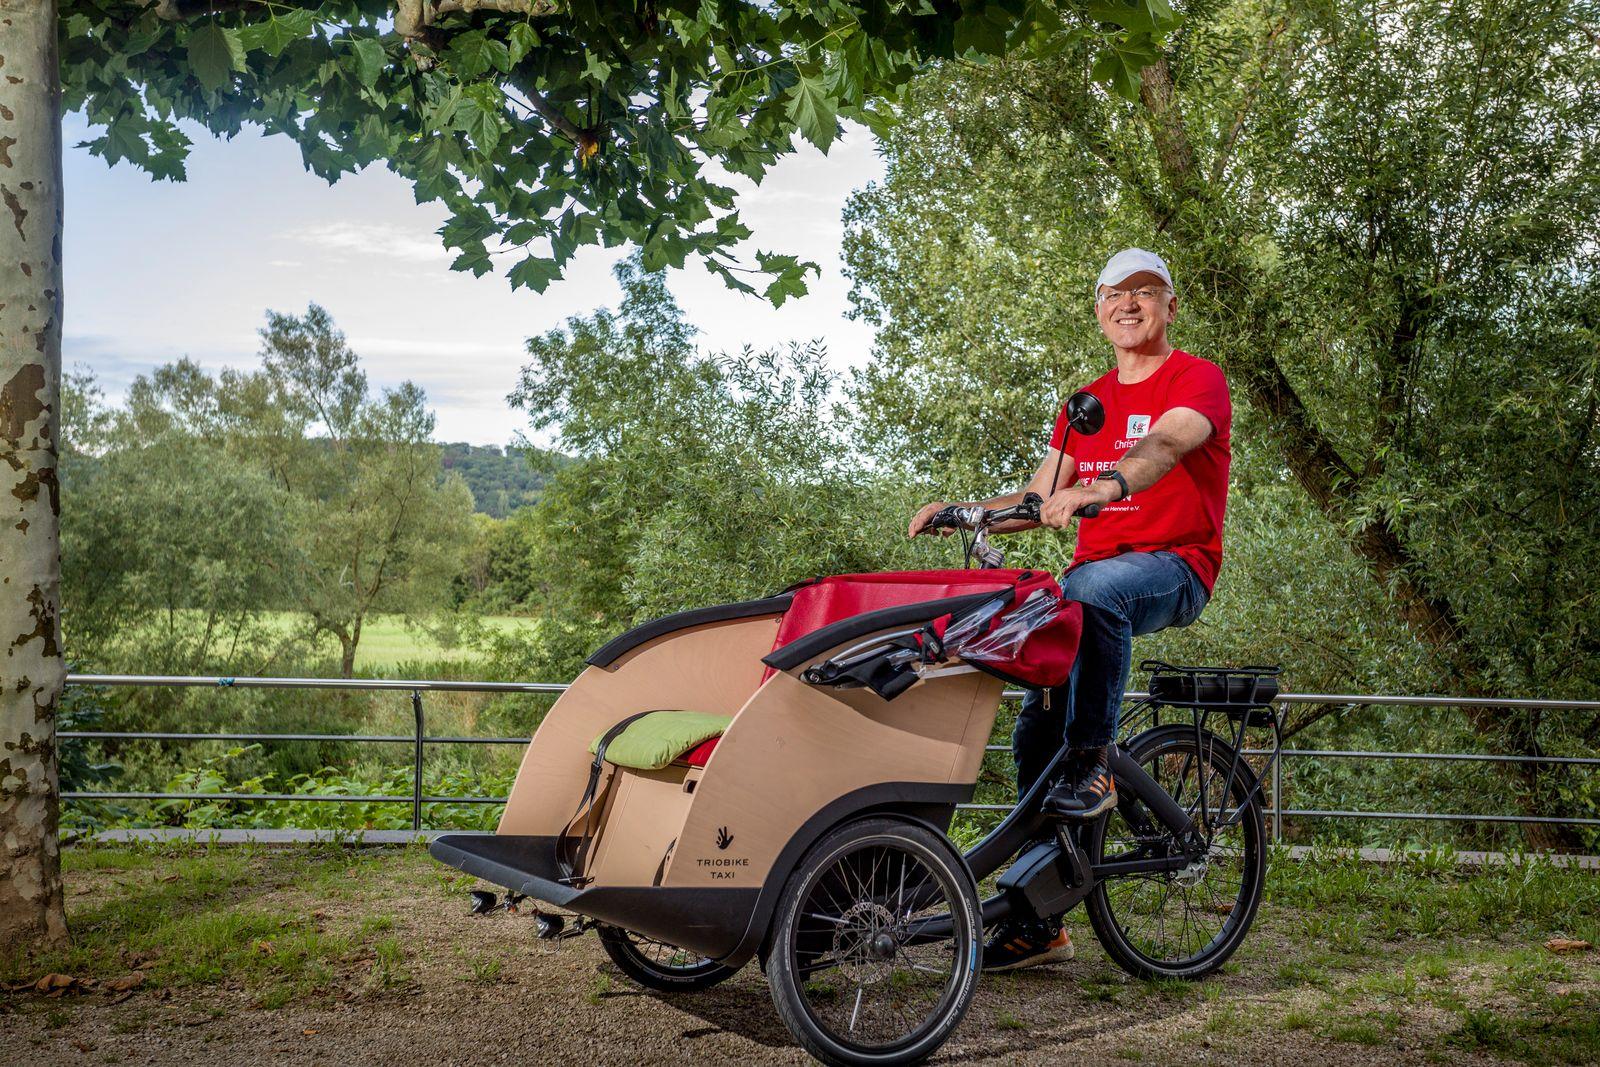 Rikschafahrer Christoph Luegering